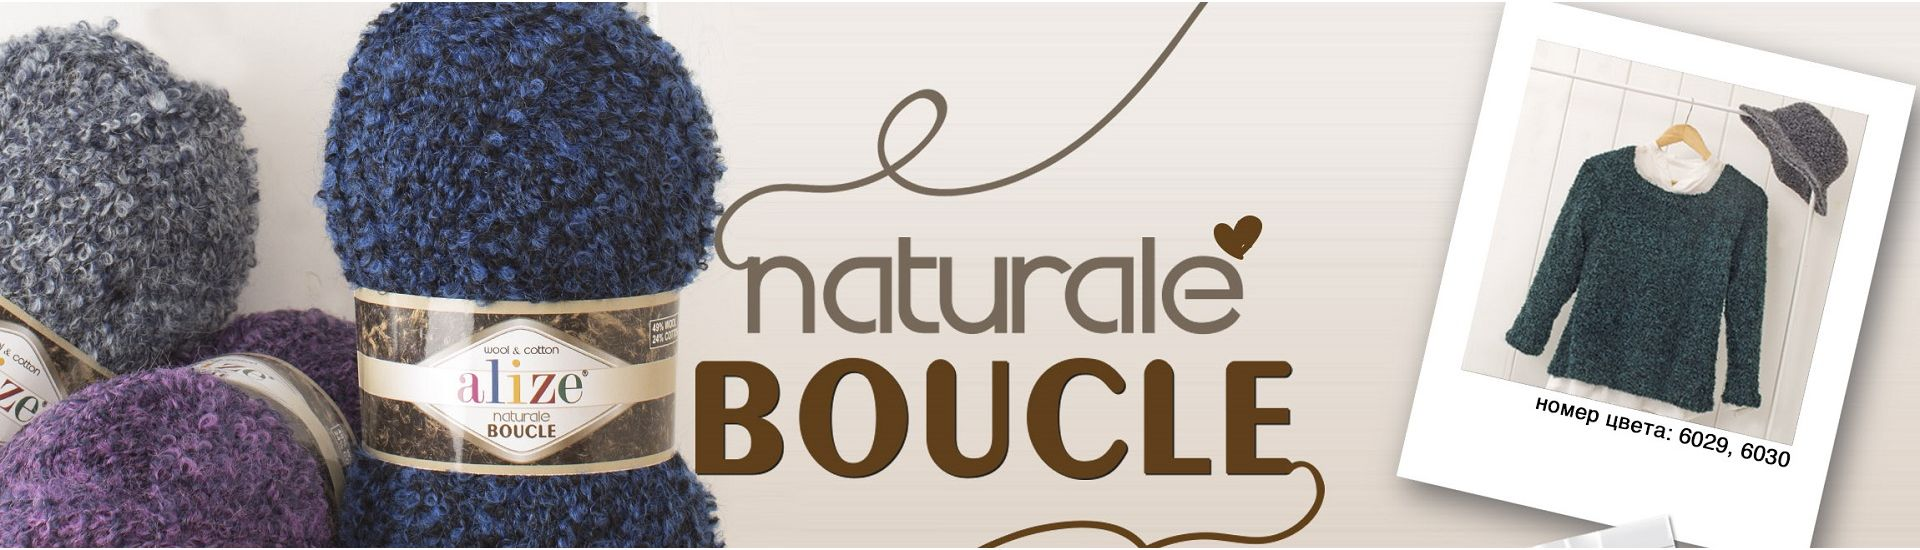 Naturale Boucle